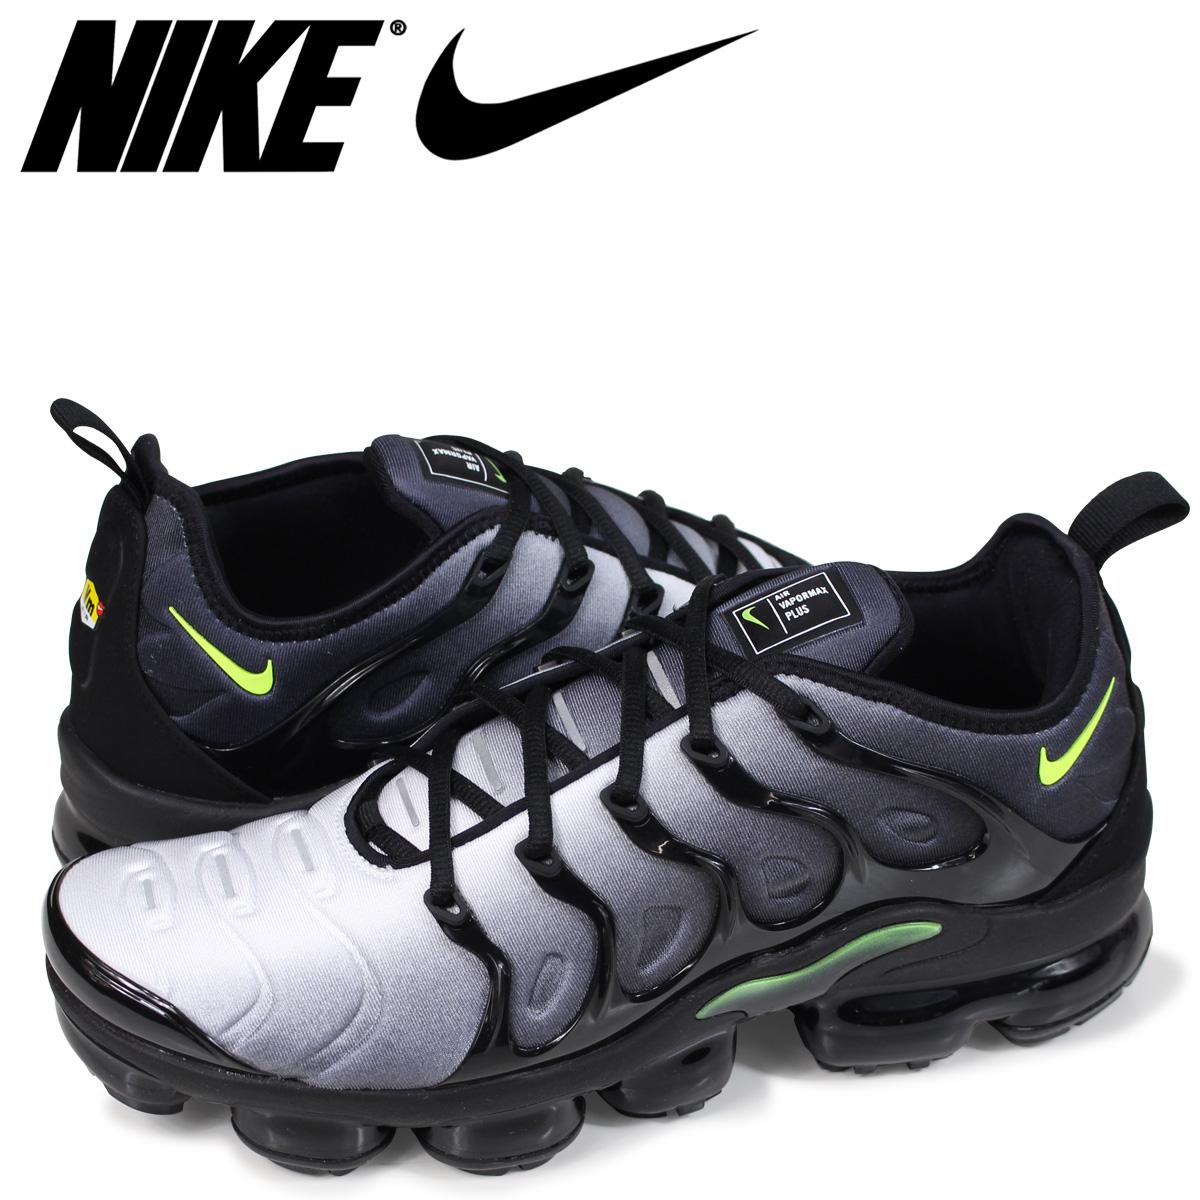 bcd44988589eeb SneaK Online Shop  Nike NIKE vapor max plus sneakers men AIR ...